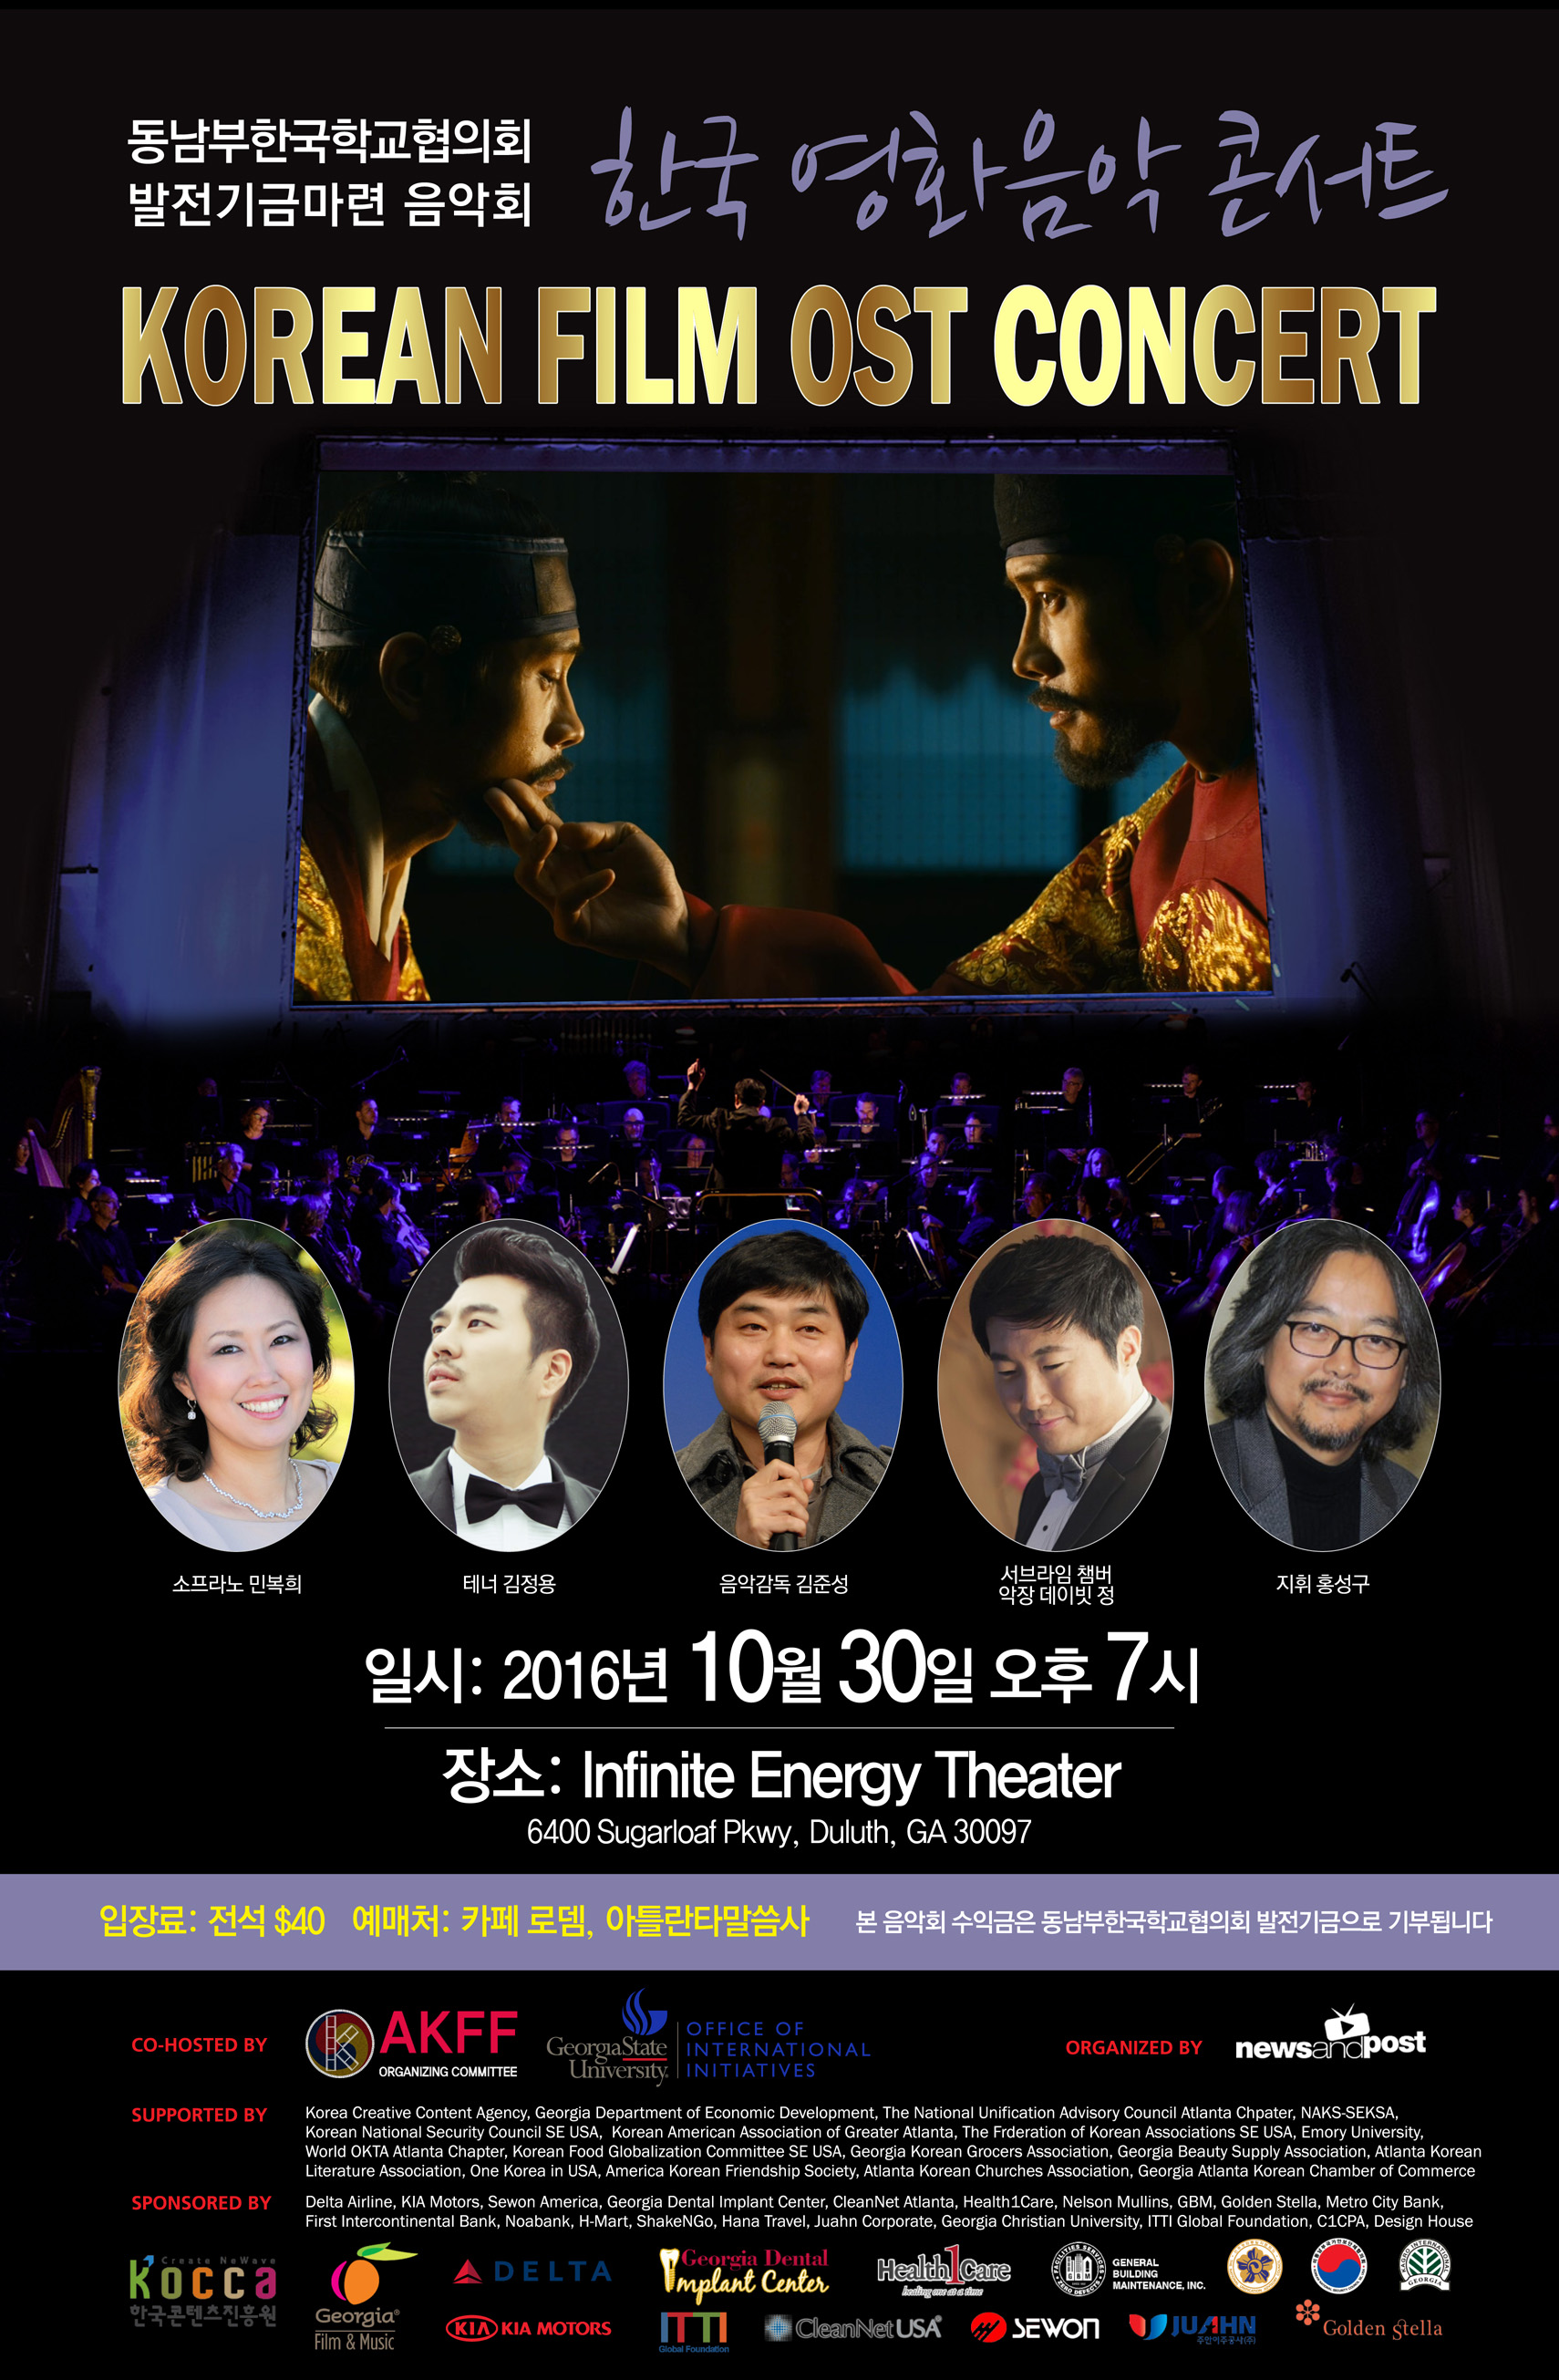 OST_Concert_2016_Poster.jpg